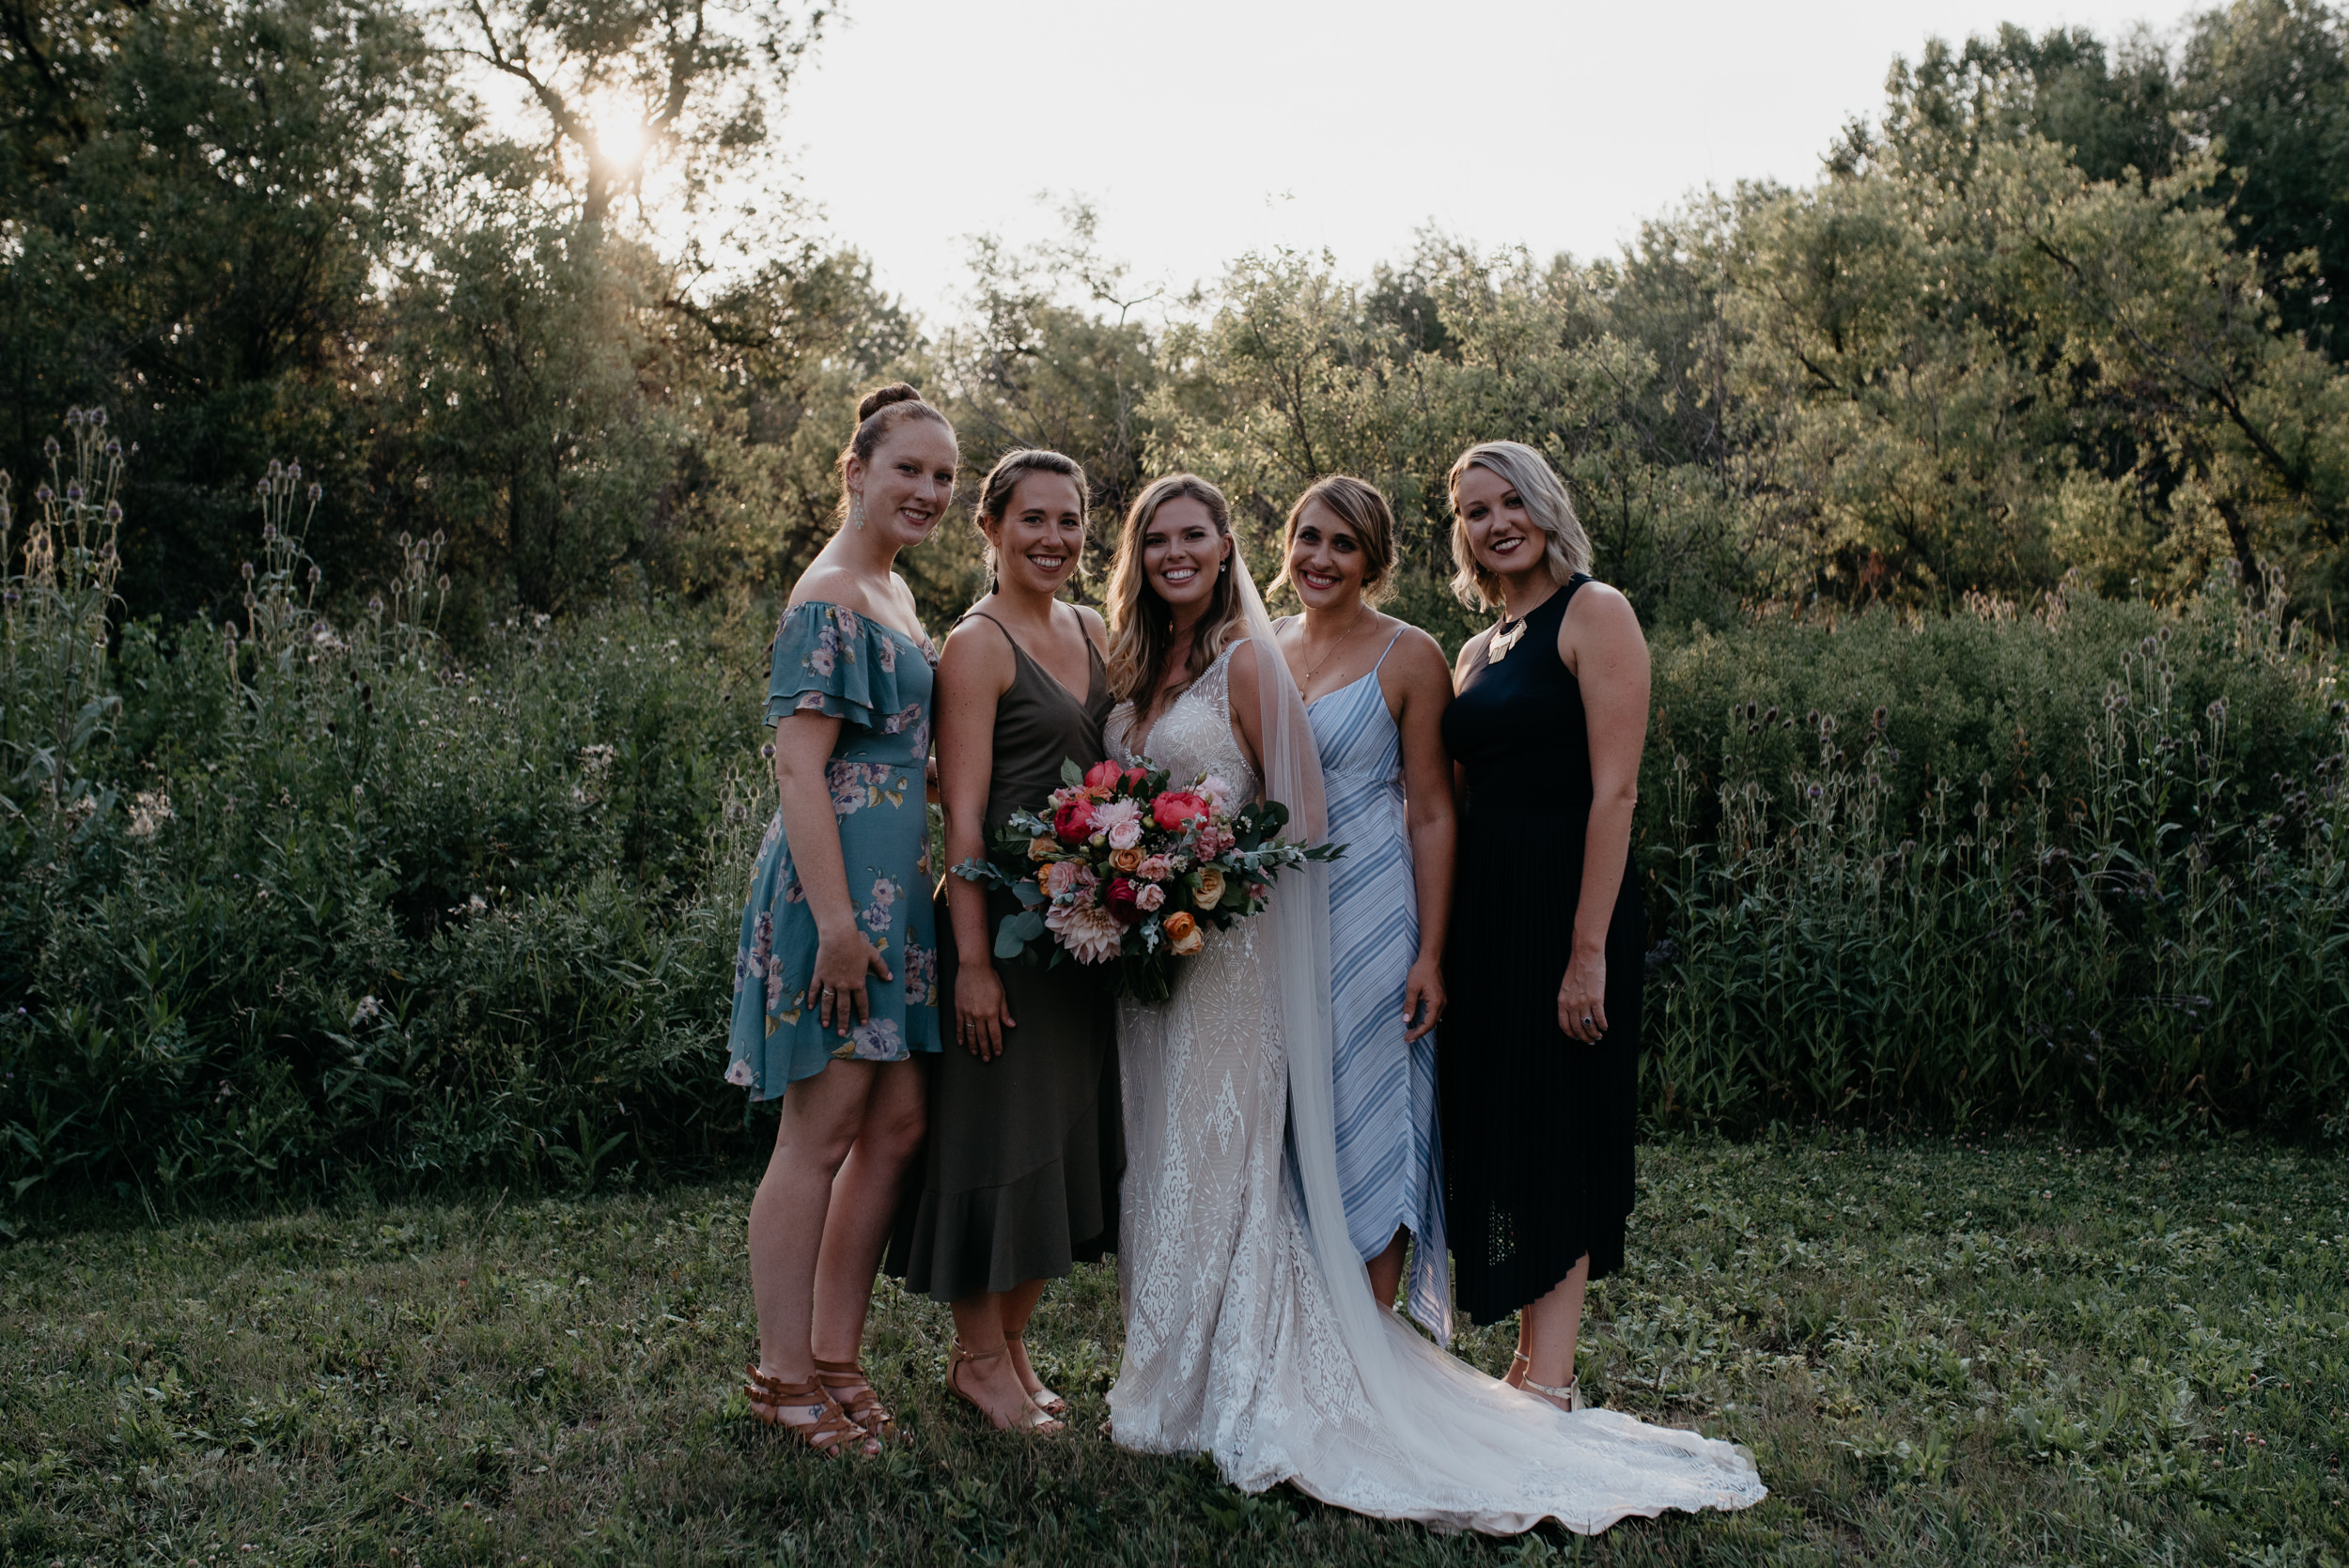 Boulder, Colorado wedding photography. Bridesmaids photos at Three Leaf Farm wedding.